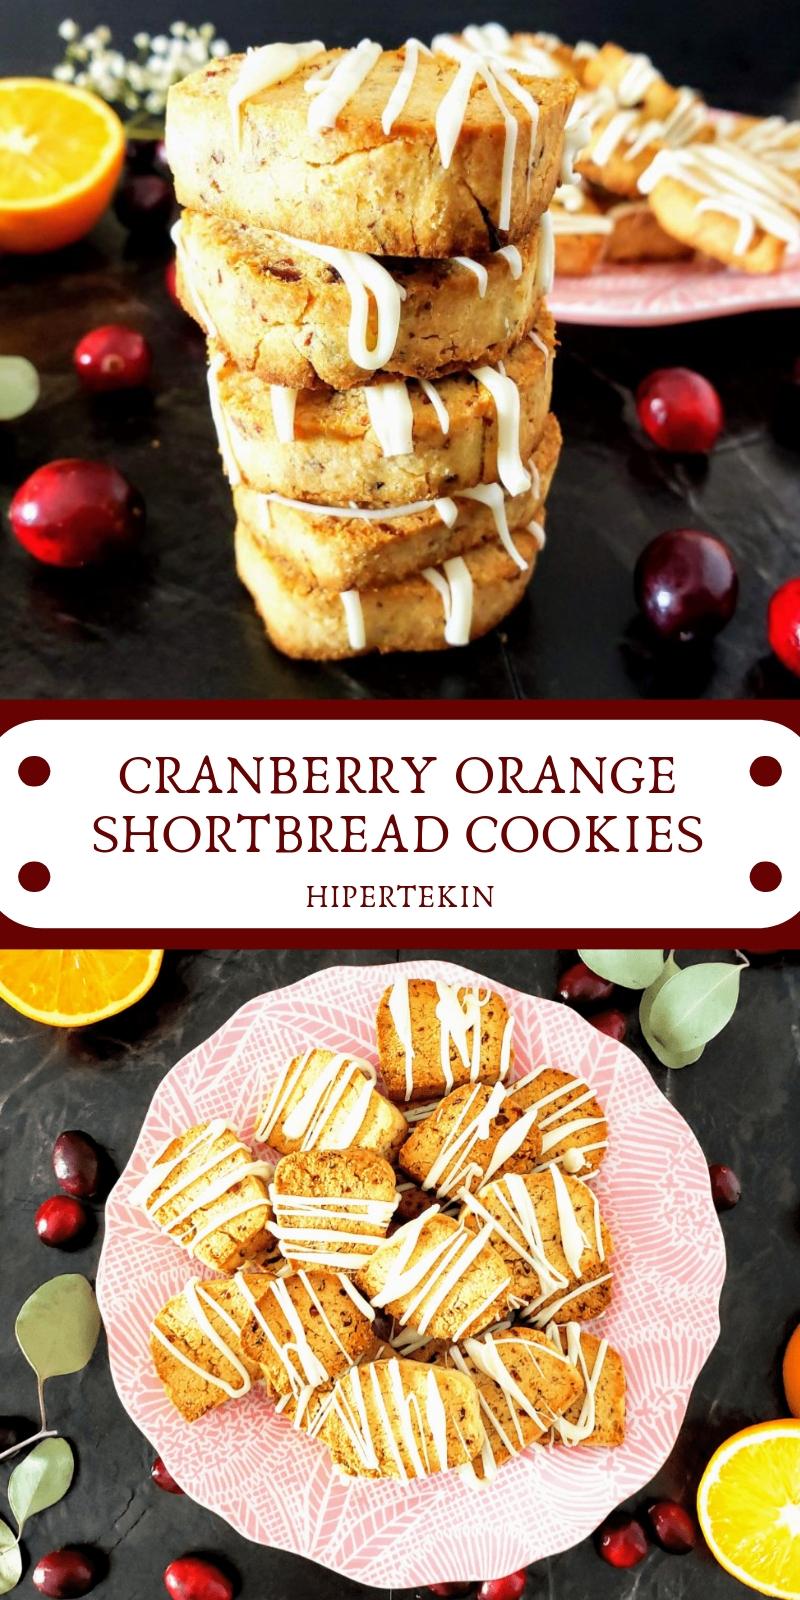 CRANBERRY ORANGE SHORTBREAD COOKIES